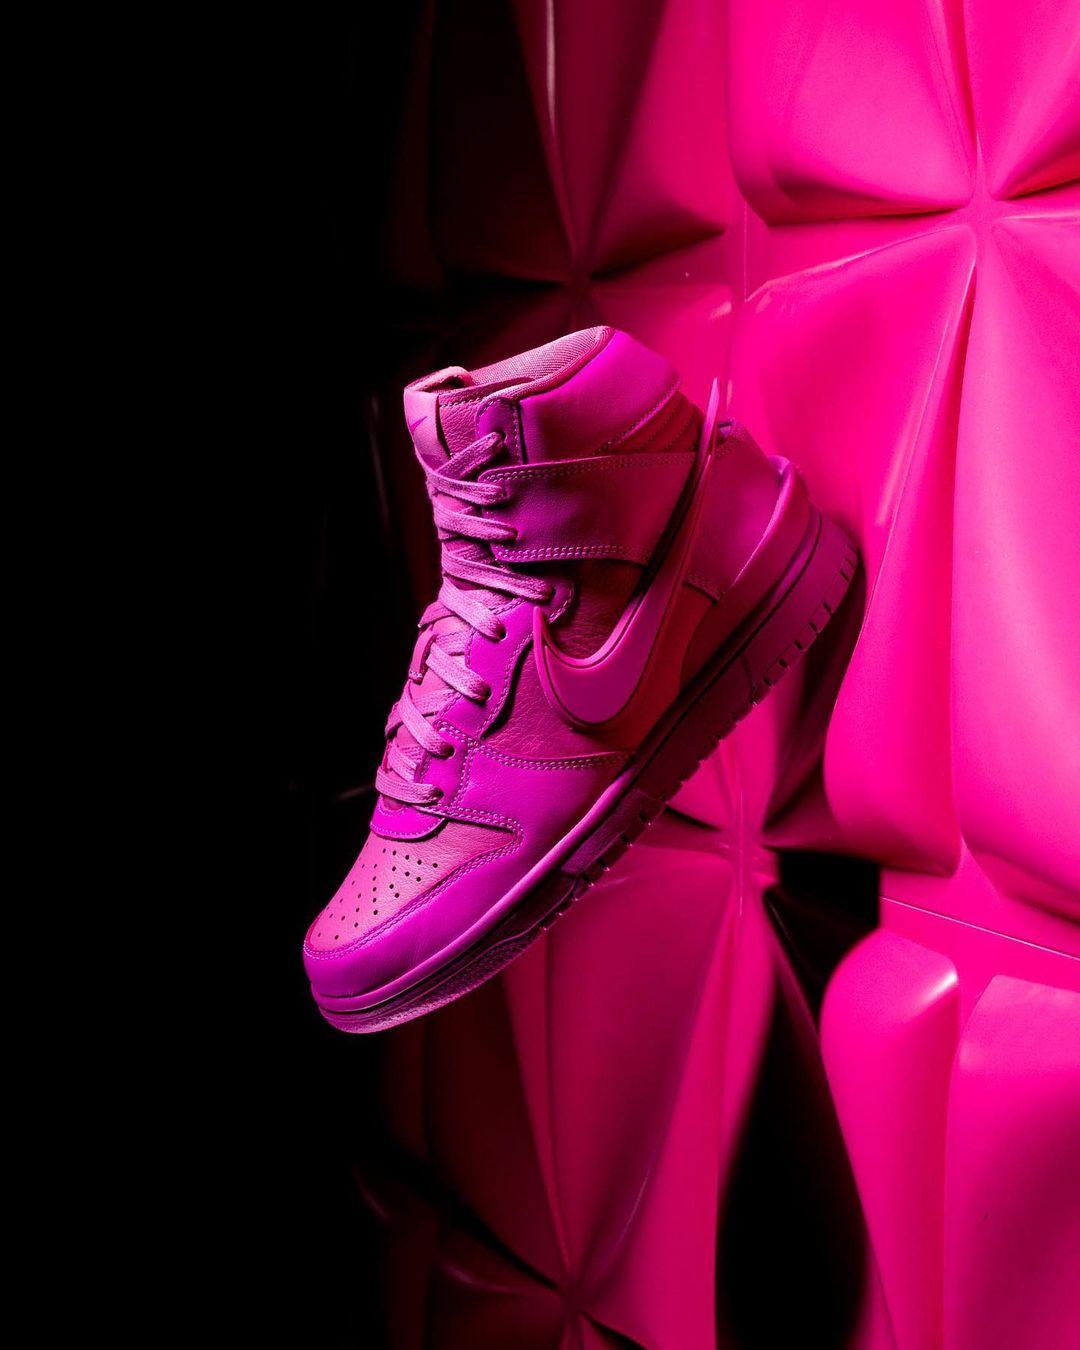 AMBUSH,Dunk Hi,Nike,发售  发售后跌 ¥1000!今早 AMBUSH x Dunk Hi 你中了吗?